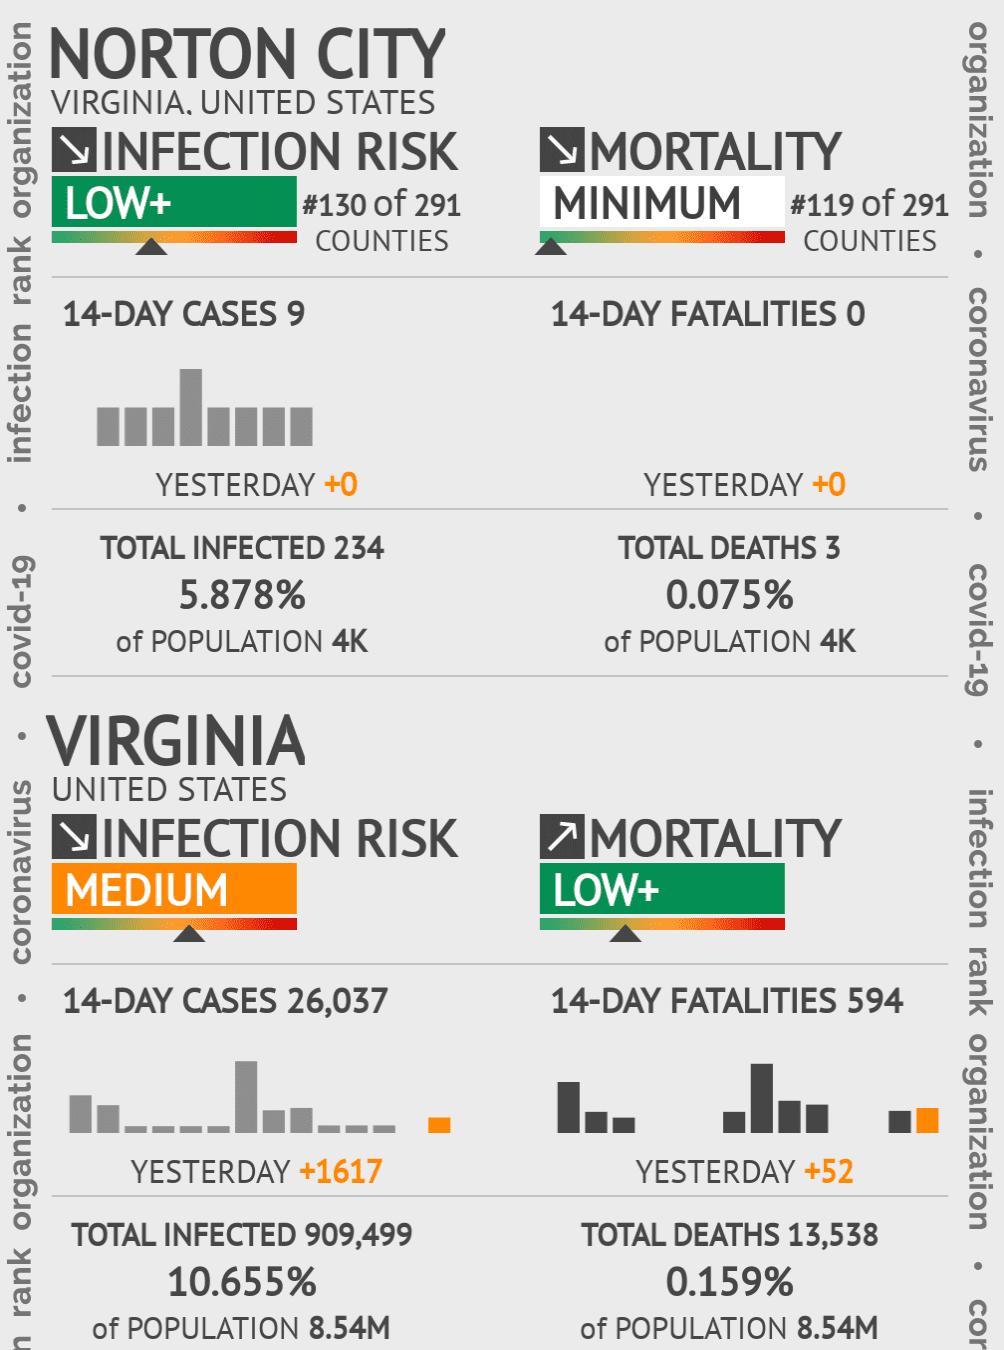 Norton City Coronavirus Covid-19 Risk of Infection on February 05, 2021